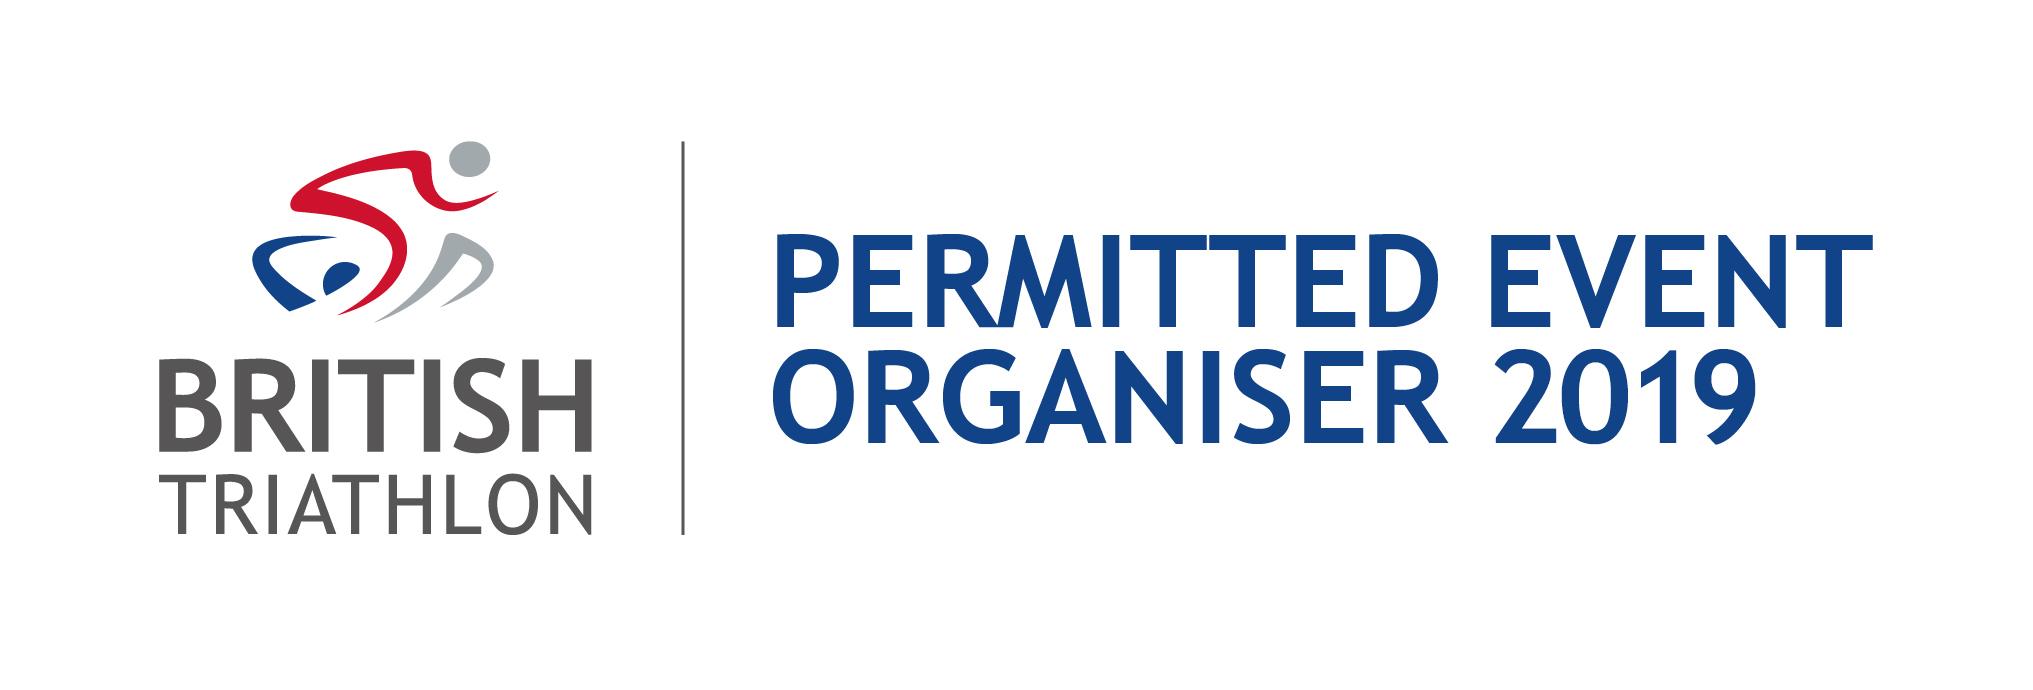 permitted_organiser_2019.jpg